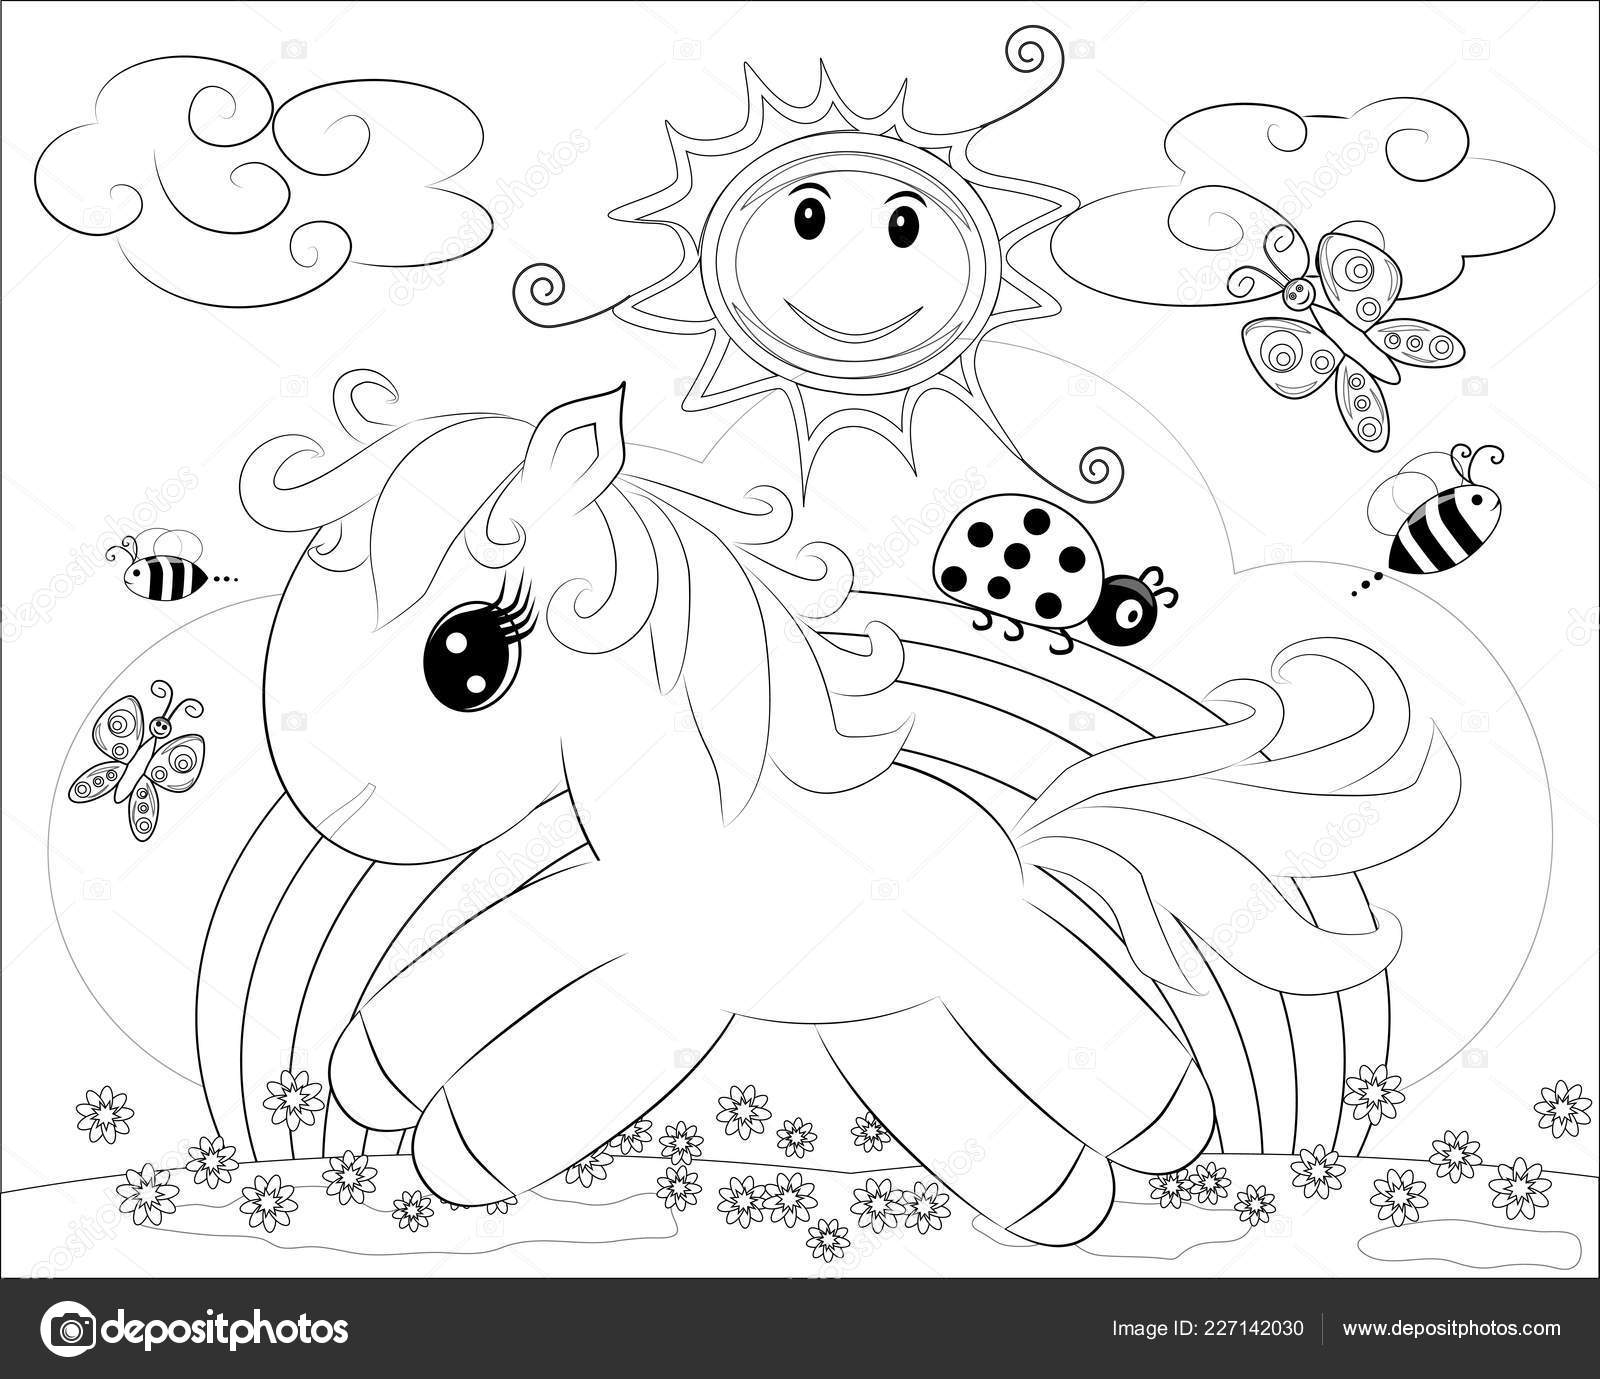 Dibujos Para Colorear Pequeño Pony Lindo Arco Iris Vector De Stock